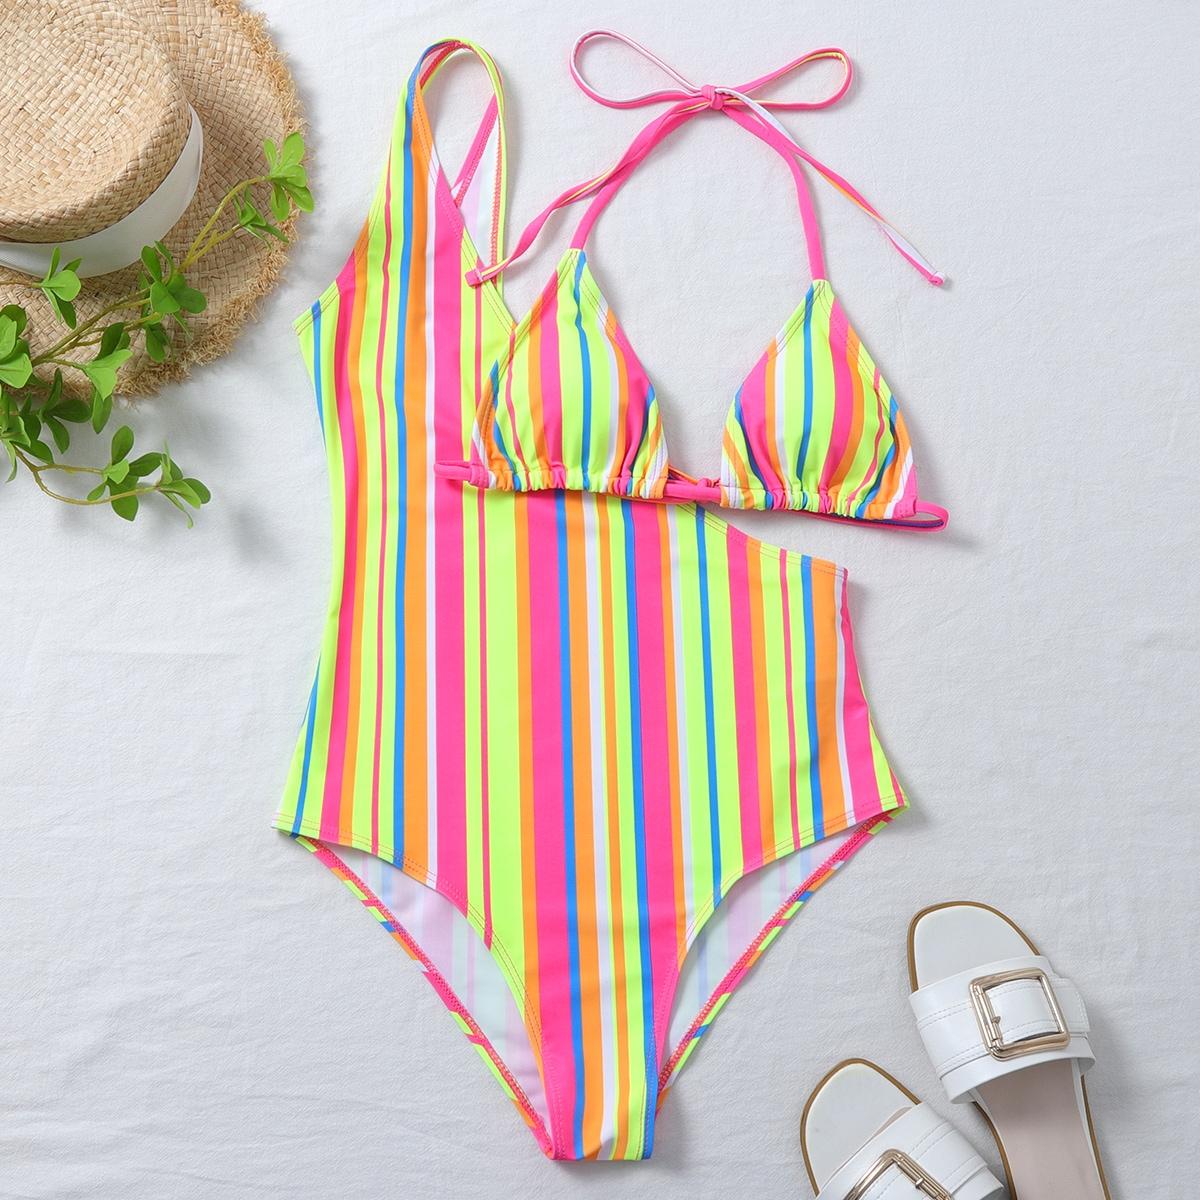 Colorful Striped Triangle One Shoulder Bikini Swimsuit